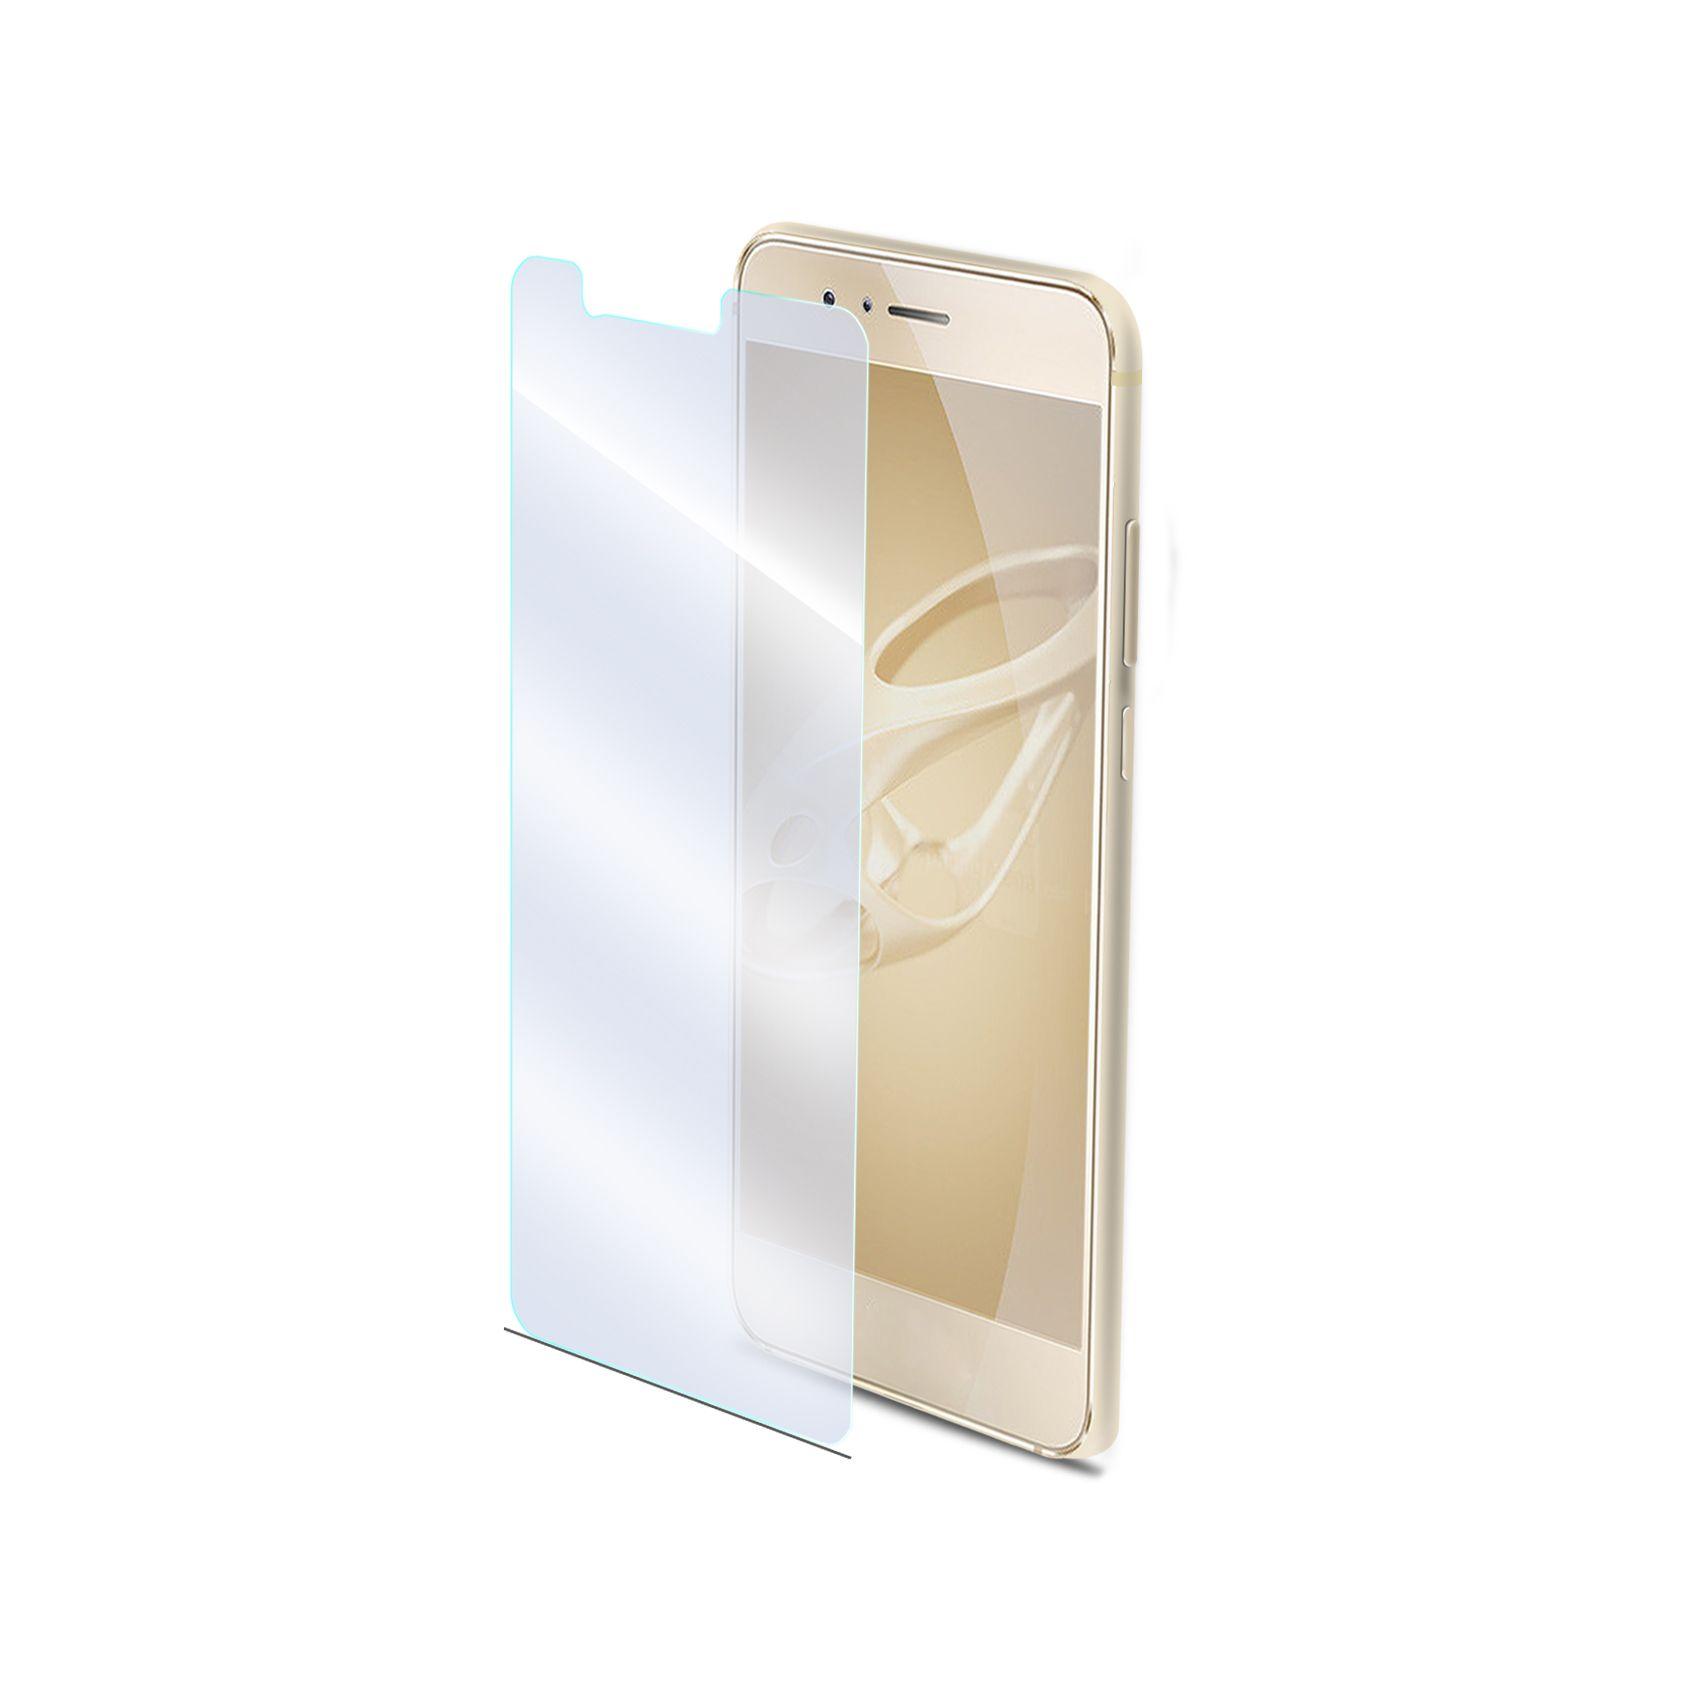 Ochranné tvrzené sklo CELLY Glass antiblueray pro Huawei Honor 8, s ANTI-BLUE-RAY vrstvou